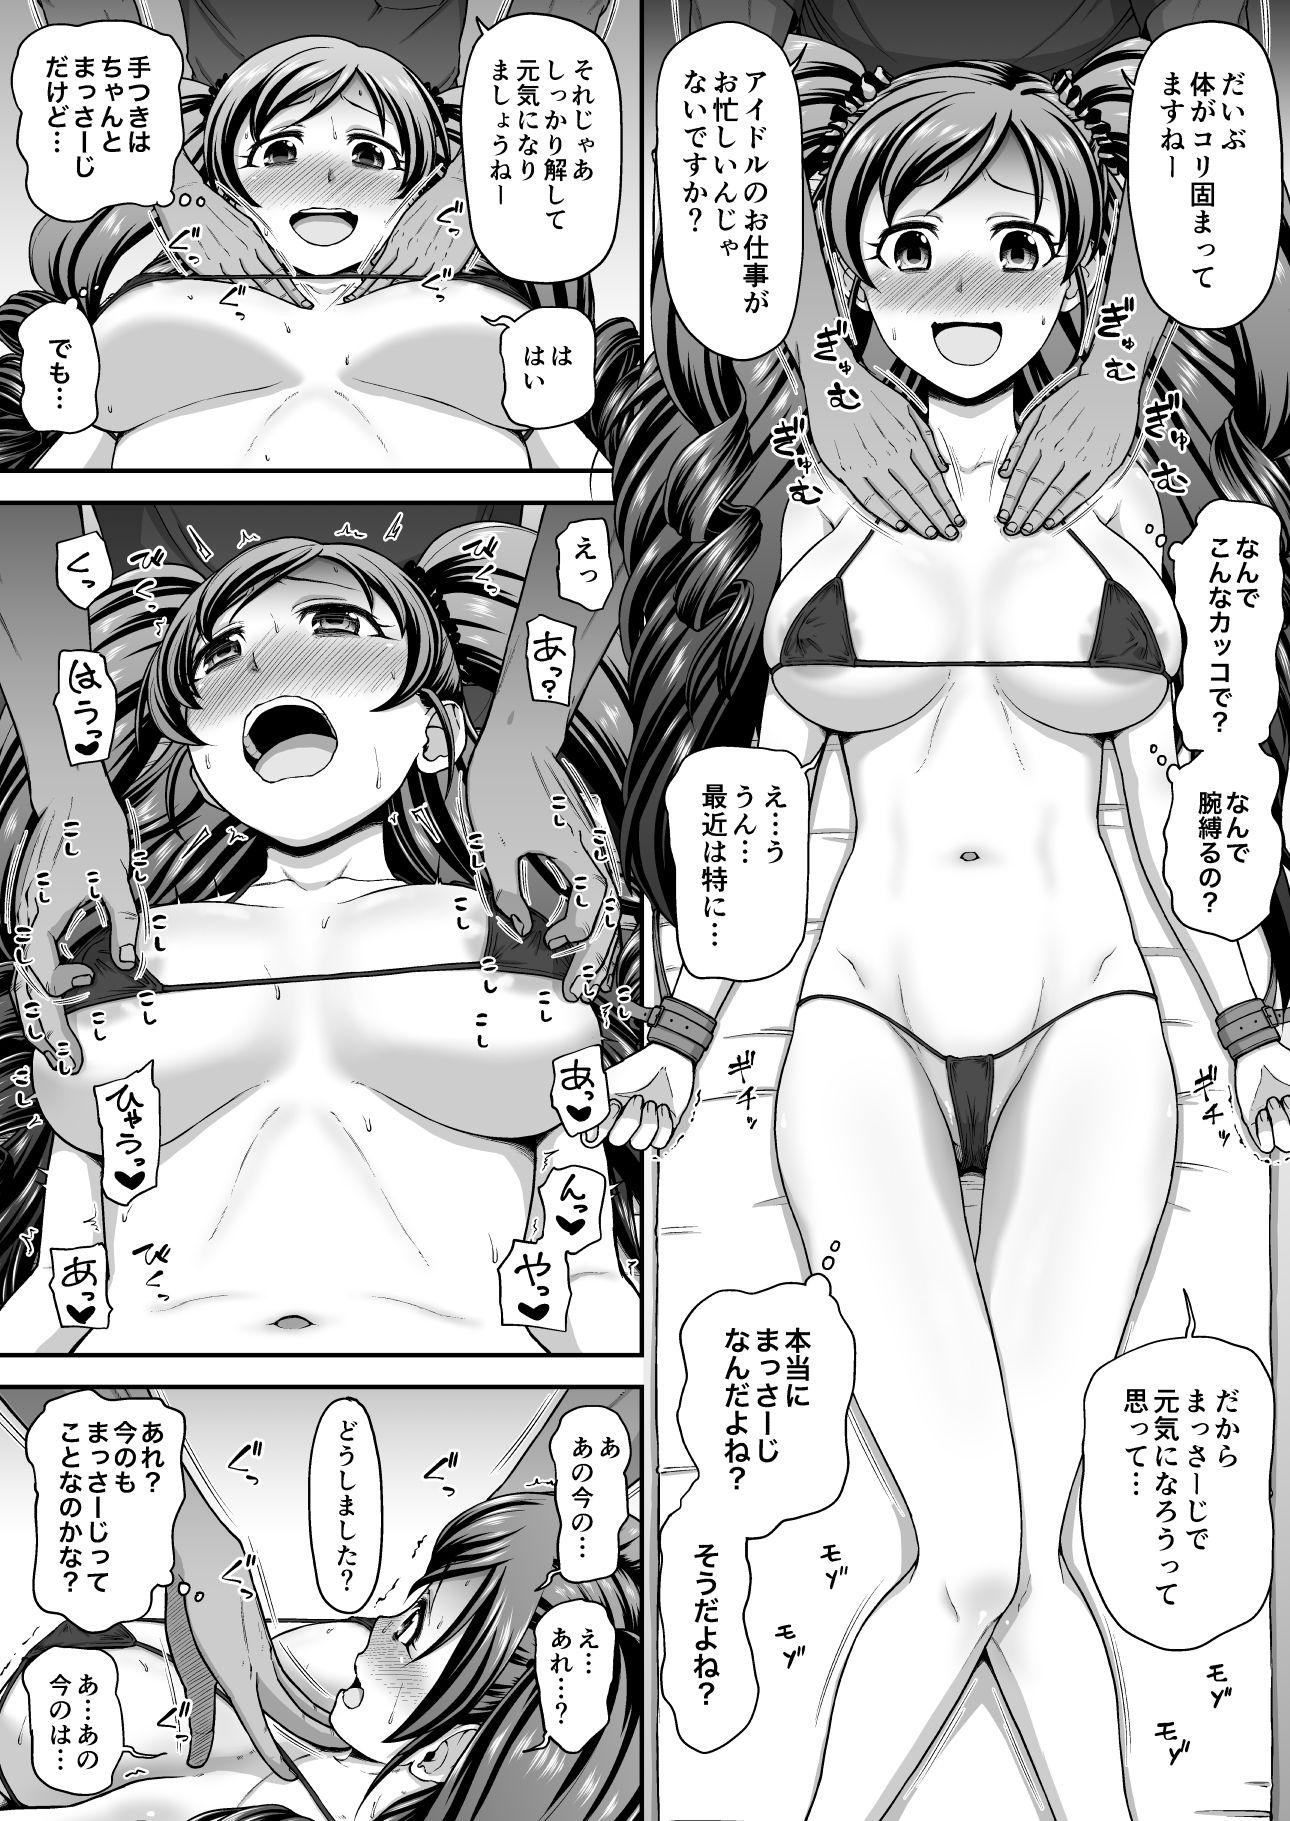 Skeb&FANBOX;落書きまとめ2